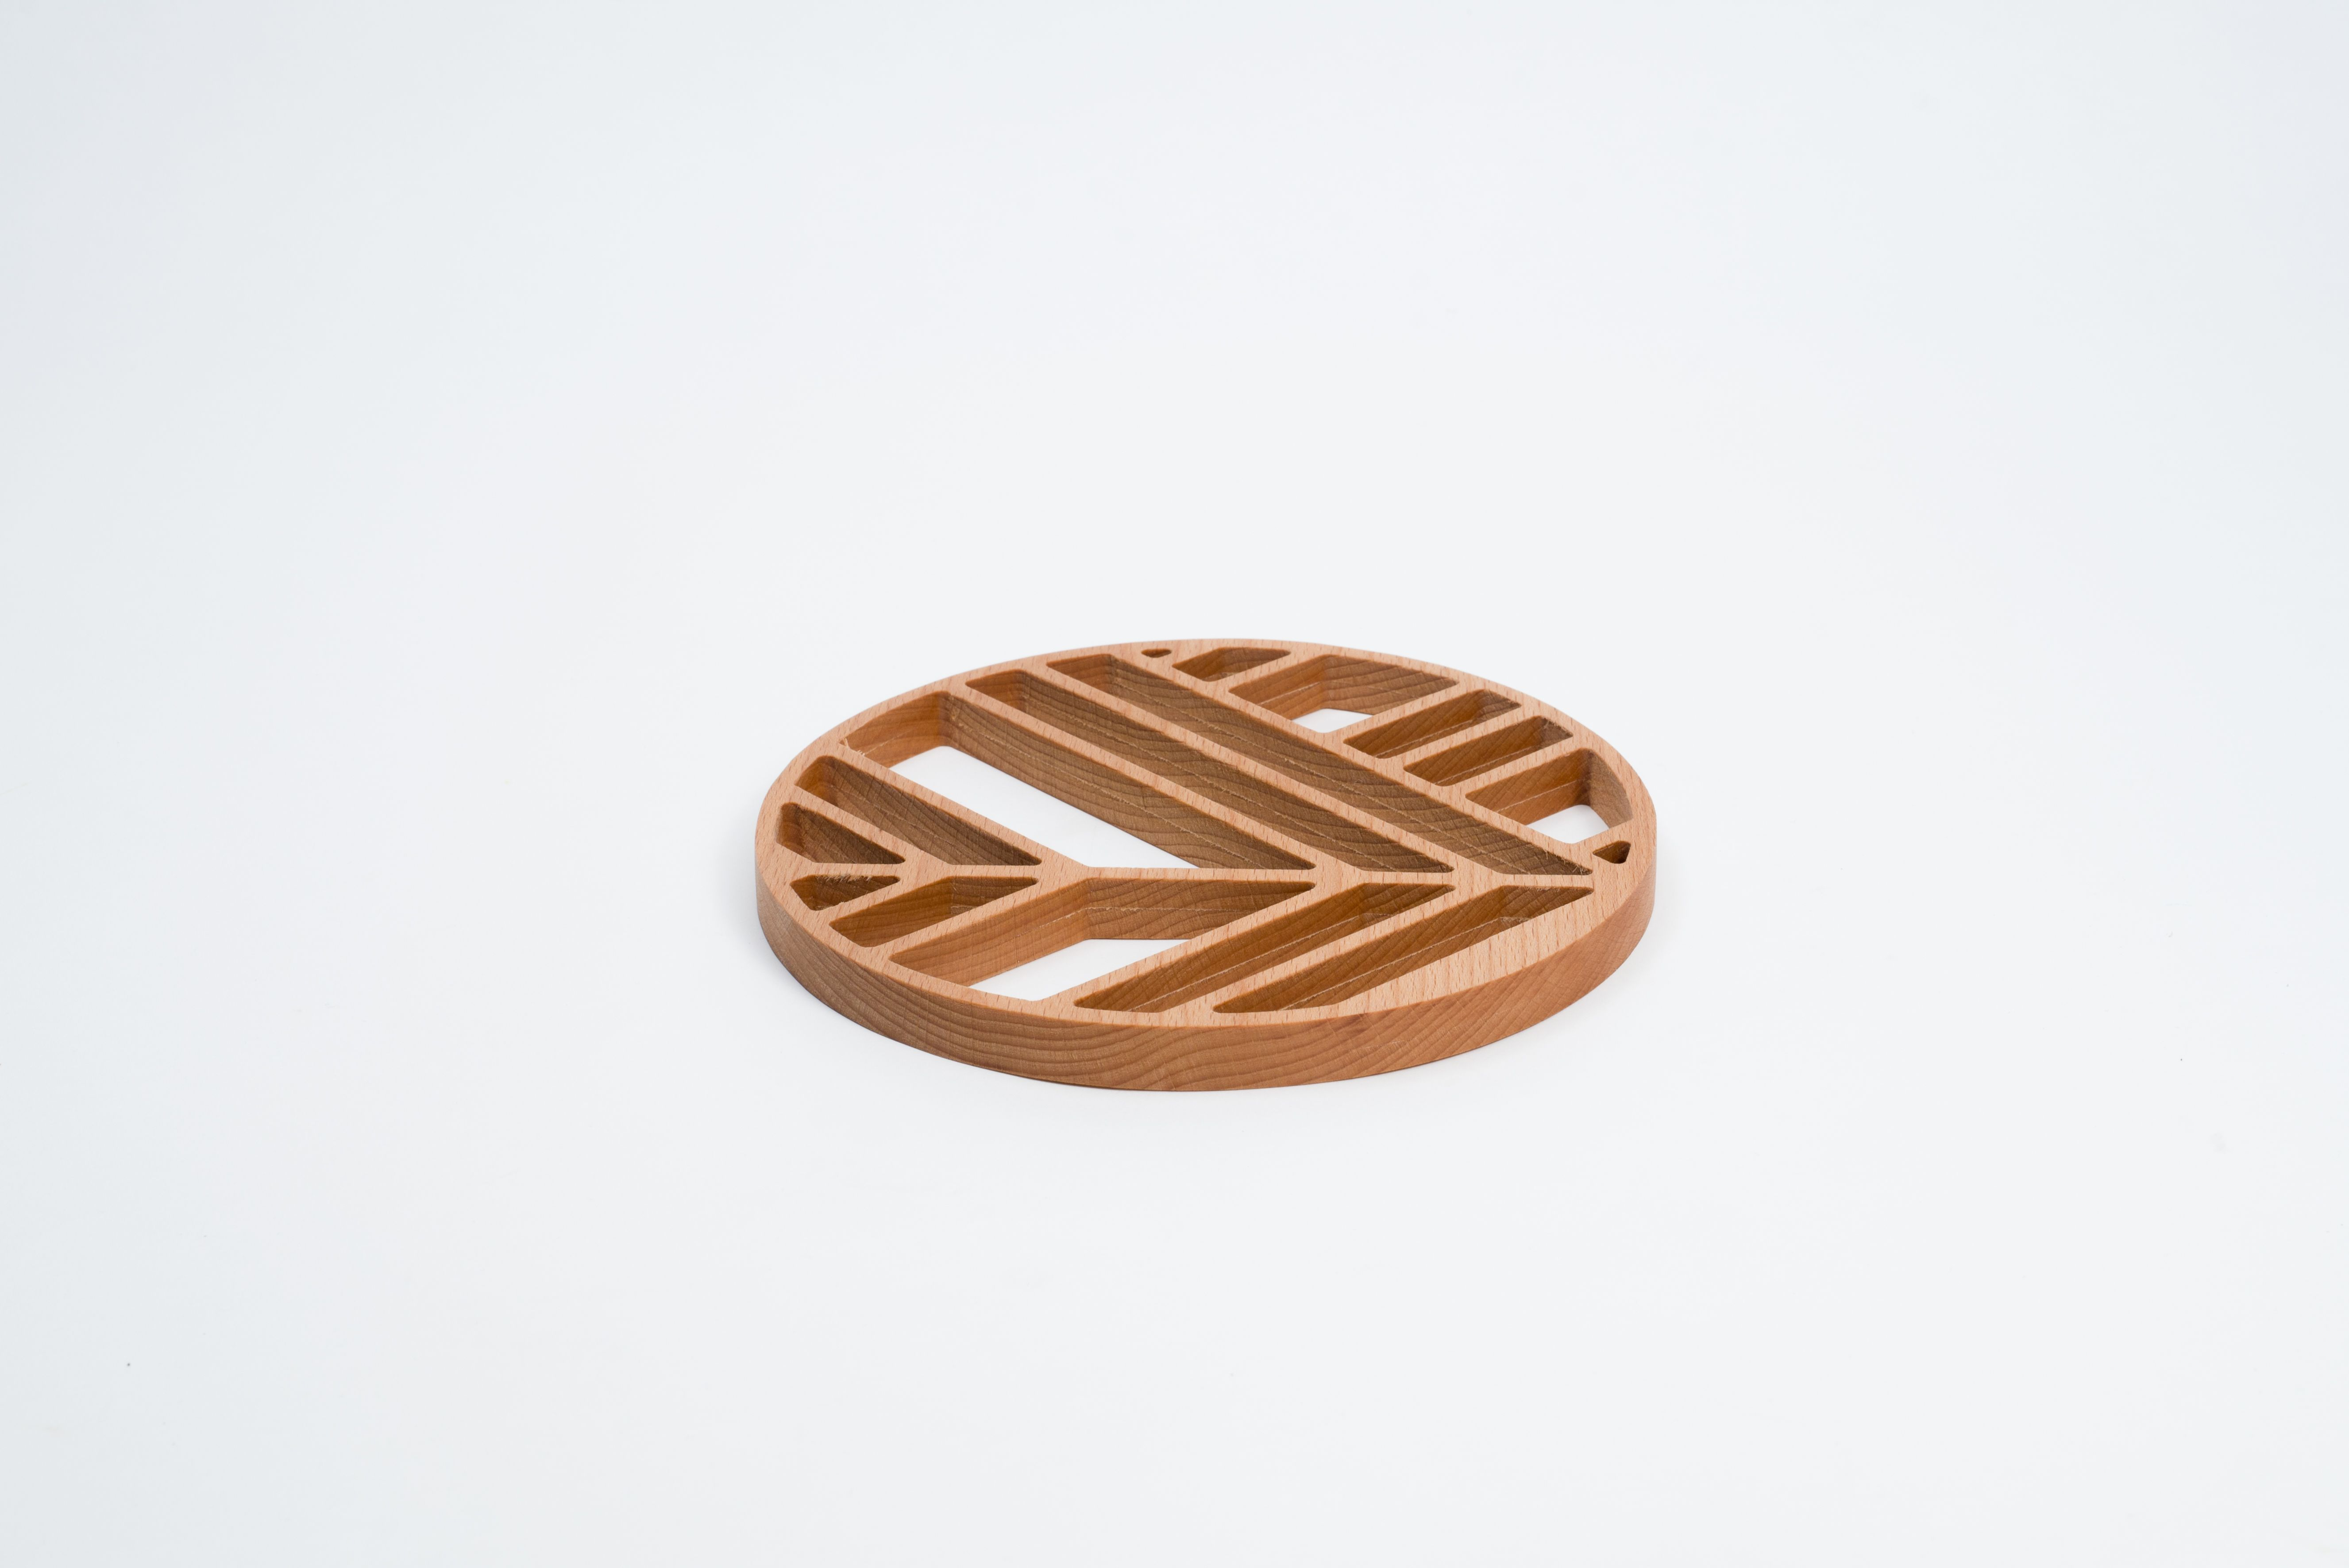 Elementi | Trivet  Designer: Elena Salmistraro (@allas) Brand: Offiseria Art Direction: @gradosei  Ph: Emanuele Chiaverini